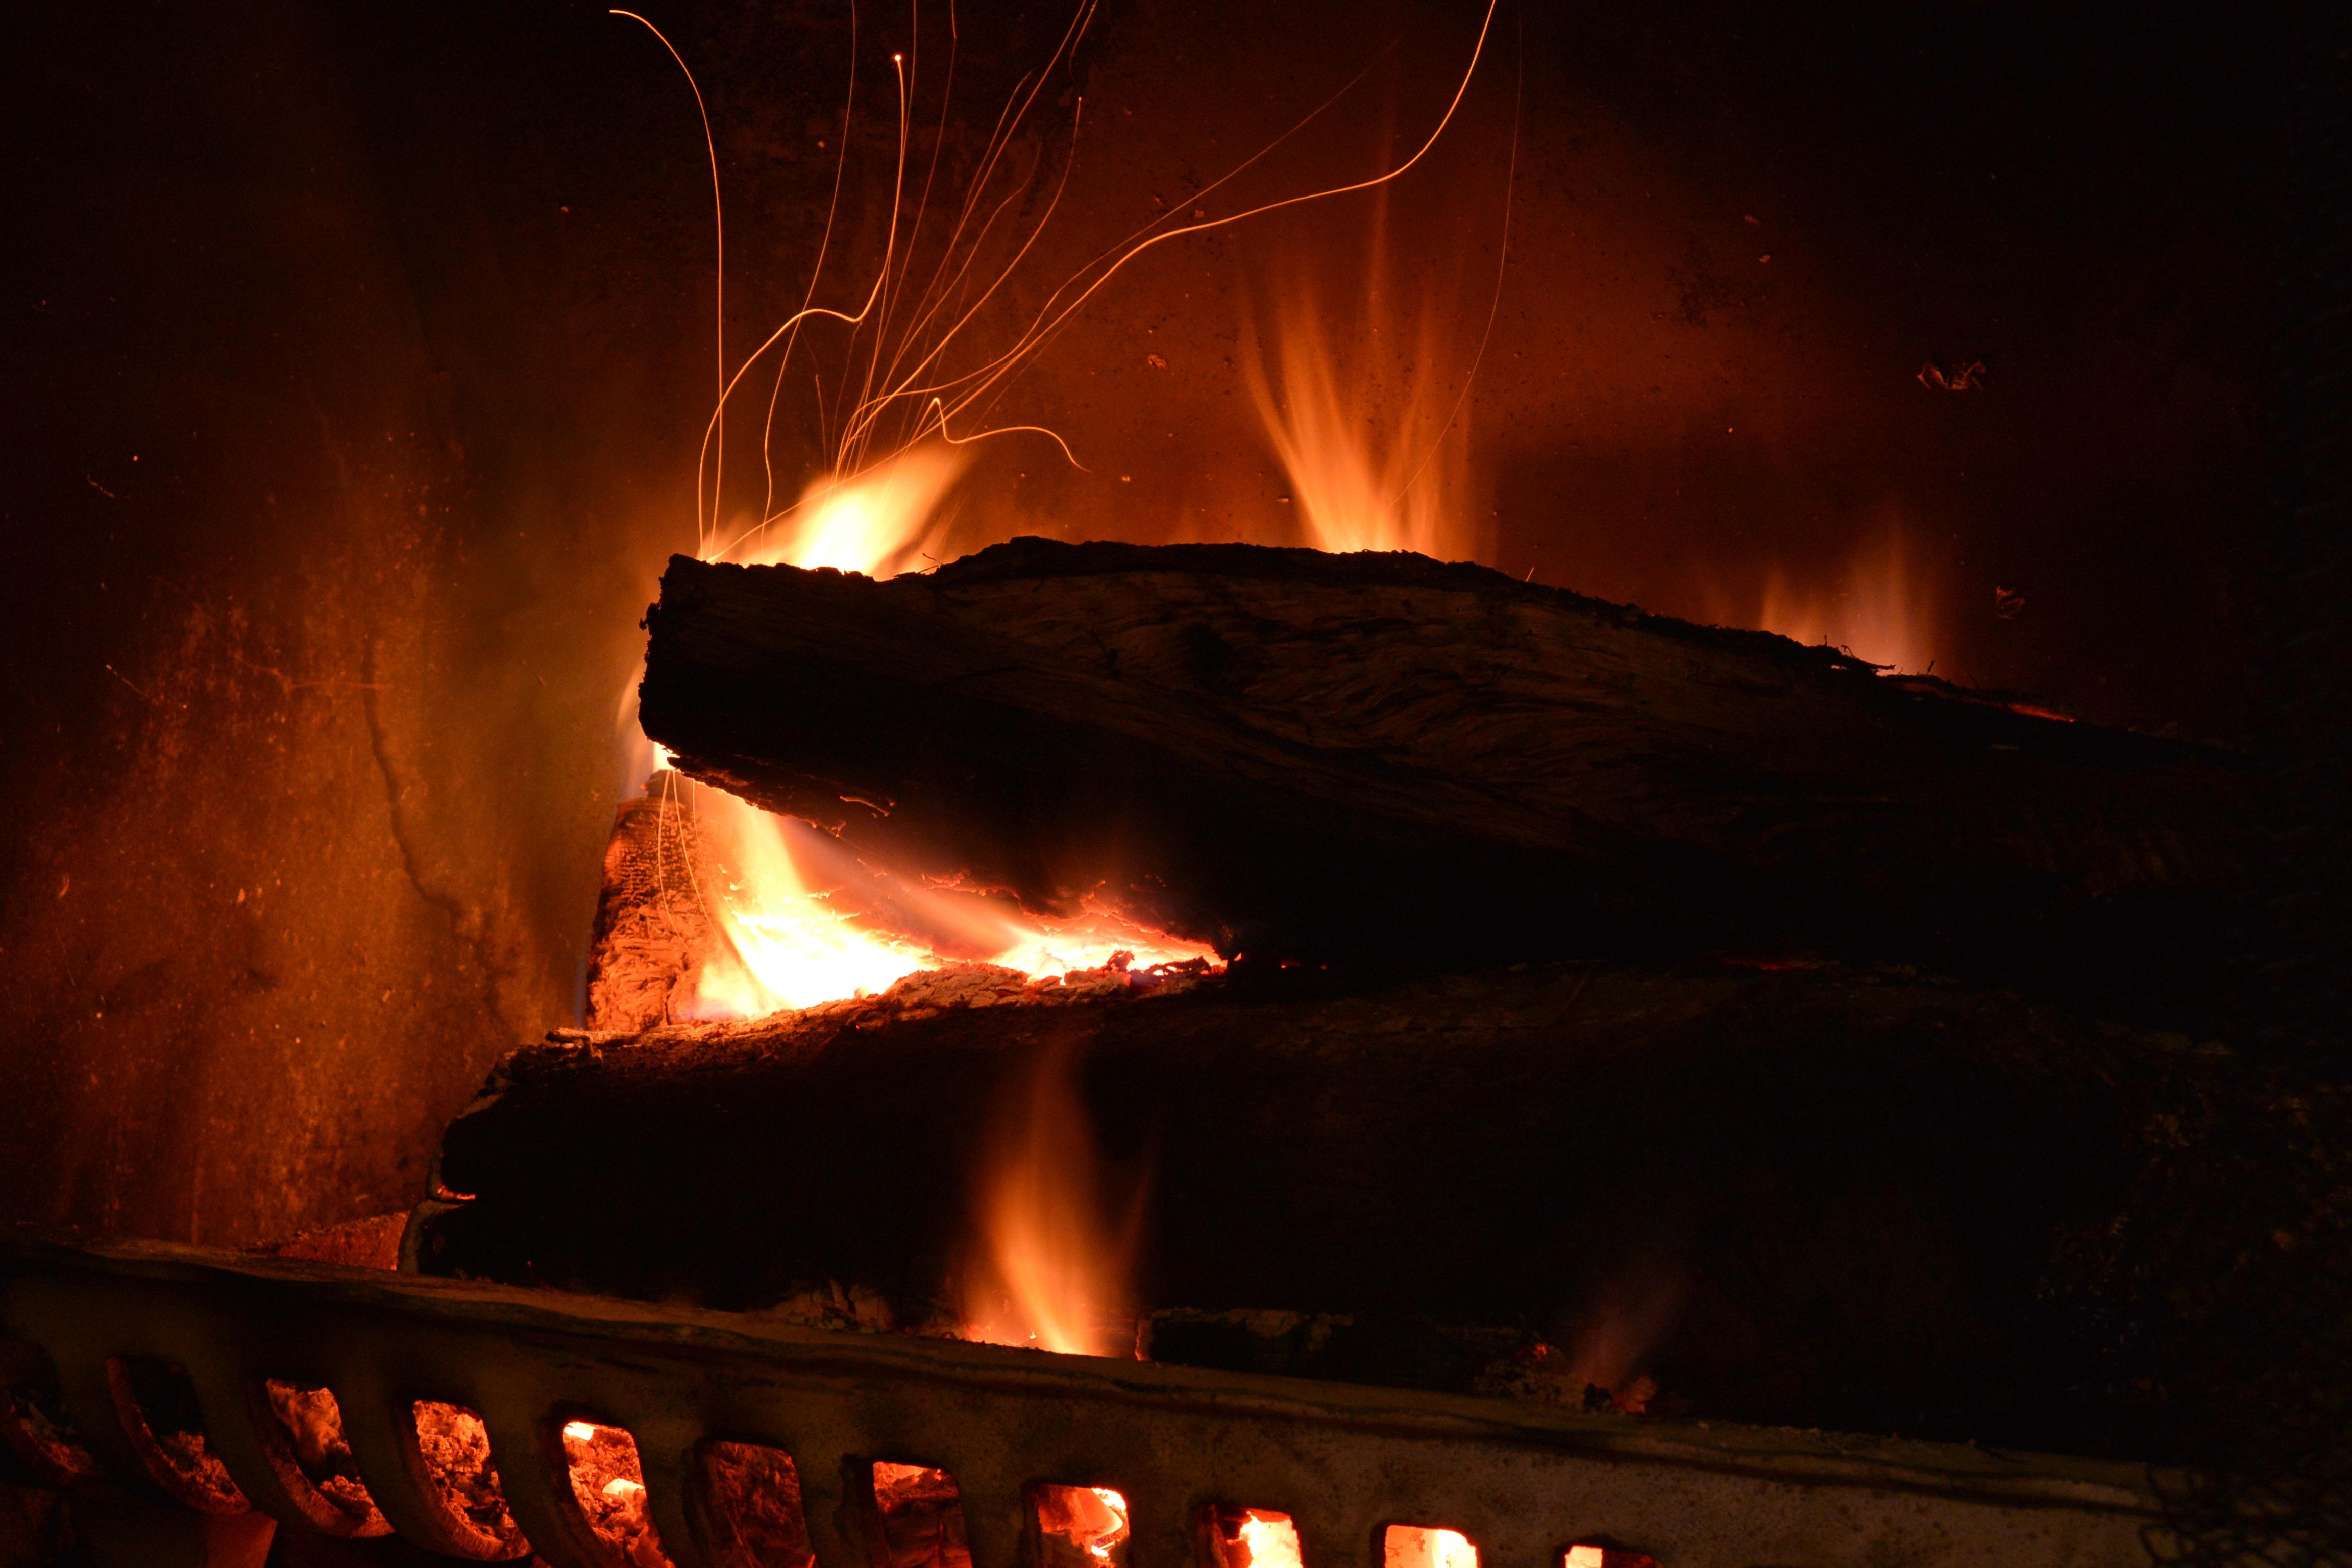 Sample photo, Nikon 1 AW1: long-exposure fire